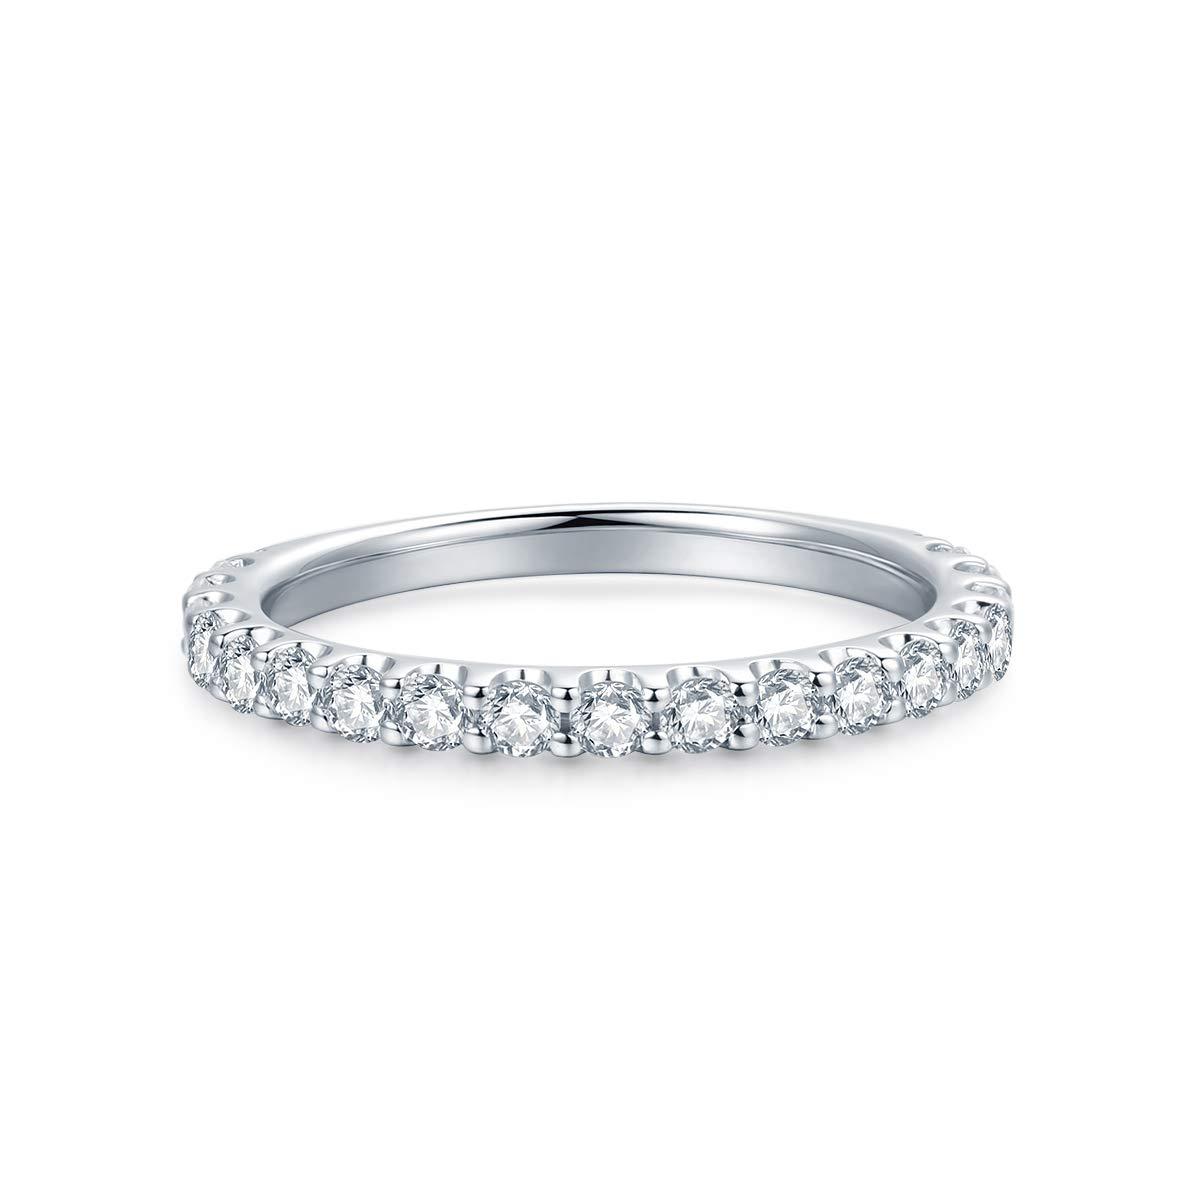 3mm Rhodium Plated Sterling Silver Simulated Diamond Cubic Zirconia CZ Half Eternity Wedding Ring (5.5)